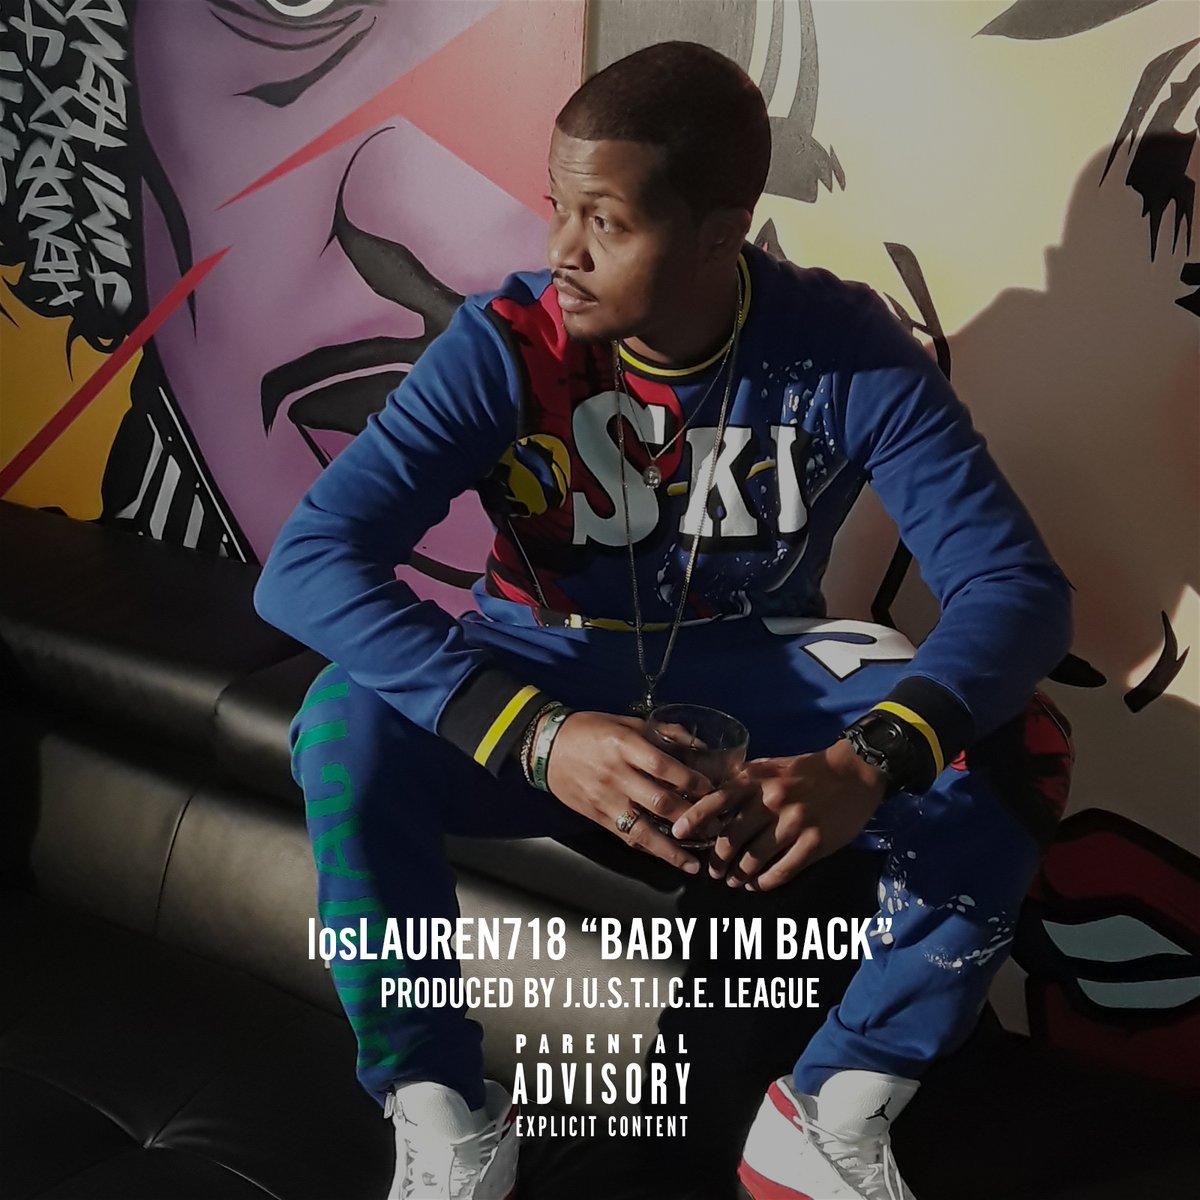 "New music alert, ""Baby I'm Back (Here We Go Again), produced by J.U.S.T.I.C.E. League, enjoy! https://vimeo.com/390843737 #droptopmusic #allergictofailure#addictedtosuccess#onlybelieversachievesuccess#hiphopmusic #valentinesgift #valentinespic.twitter.com/DEcXZXrf91"